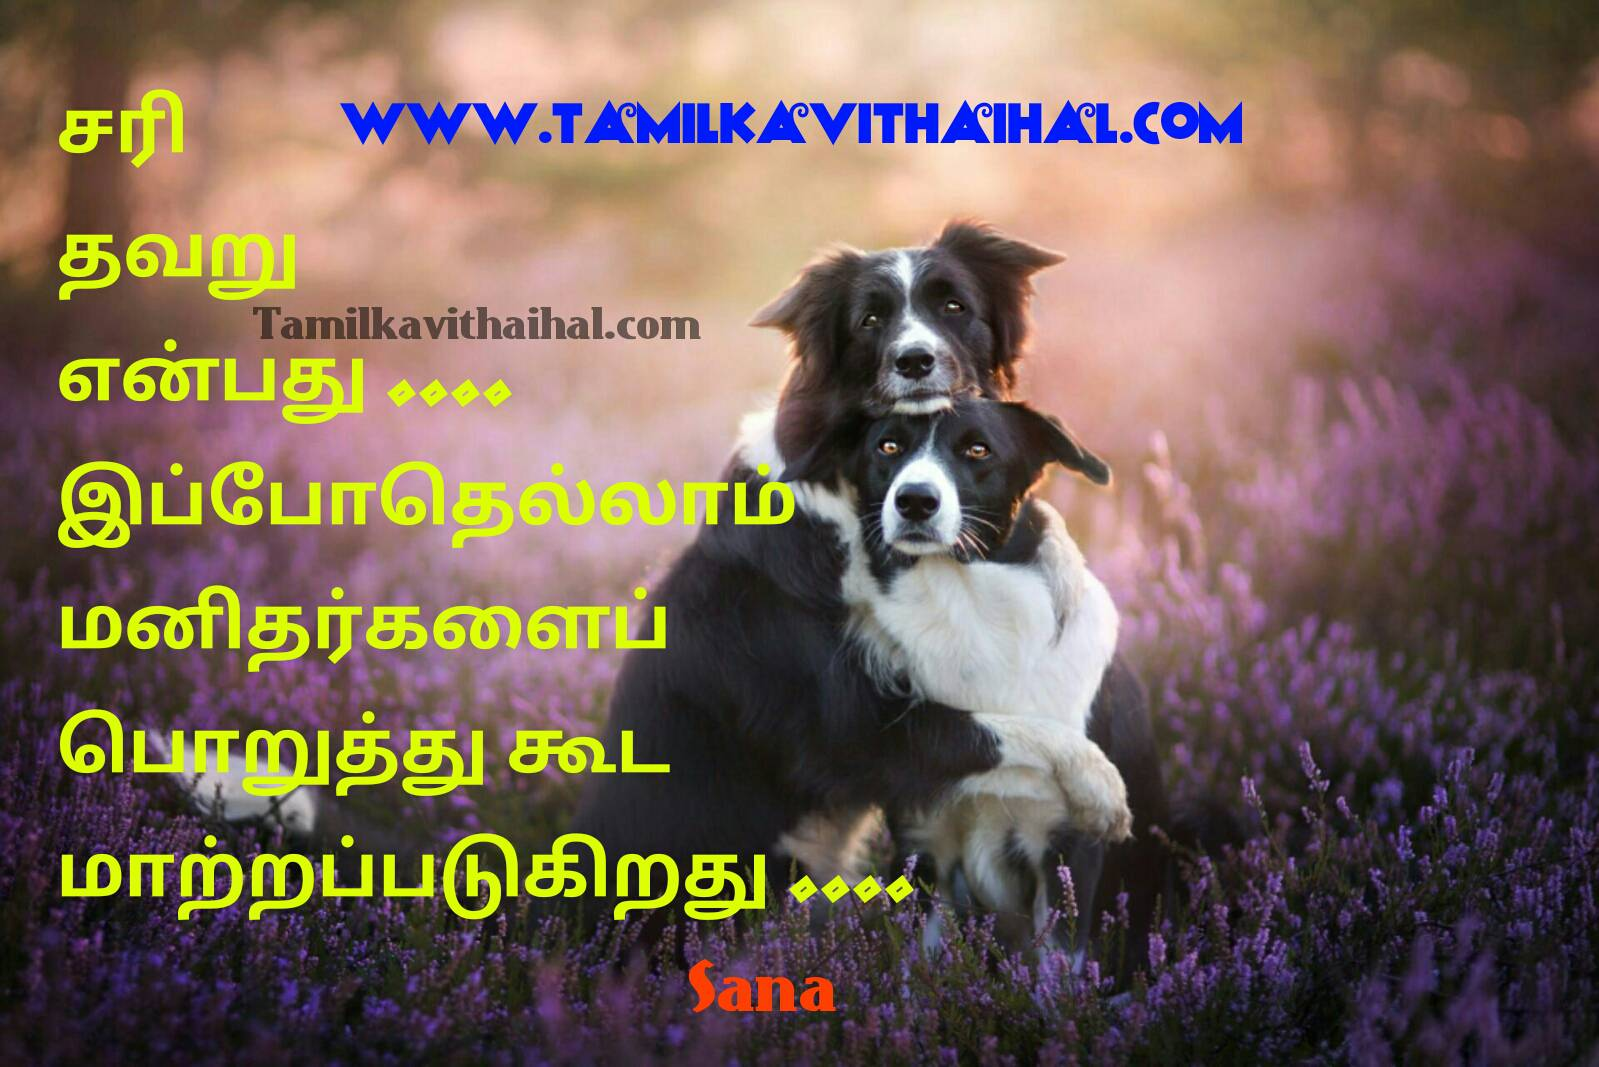 Best words for life love and future true false positive negative manithar valkkai maatram sana images download